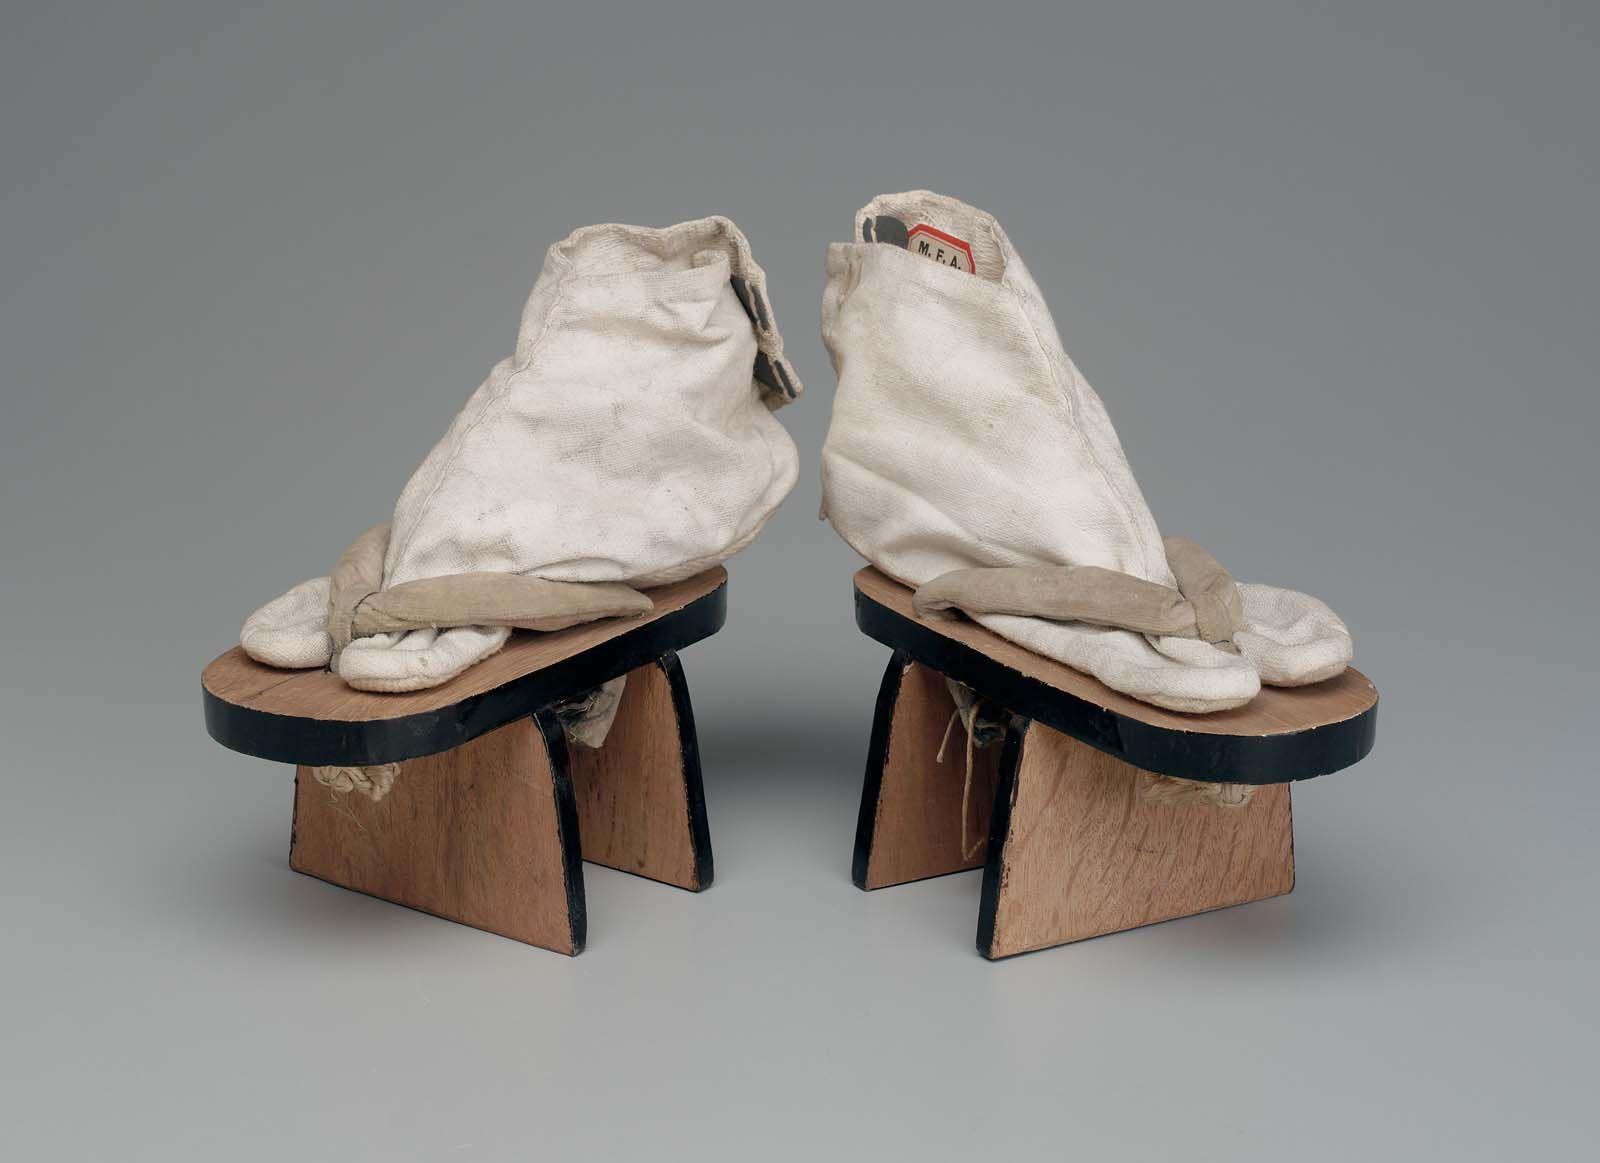 46ed0d9d406 Sandals (geta) Japanese Meiji era late 19th century